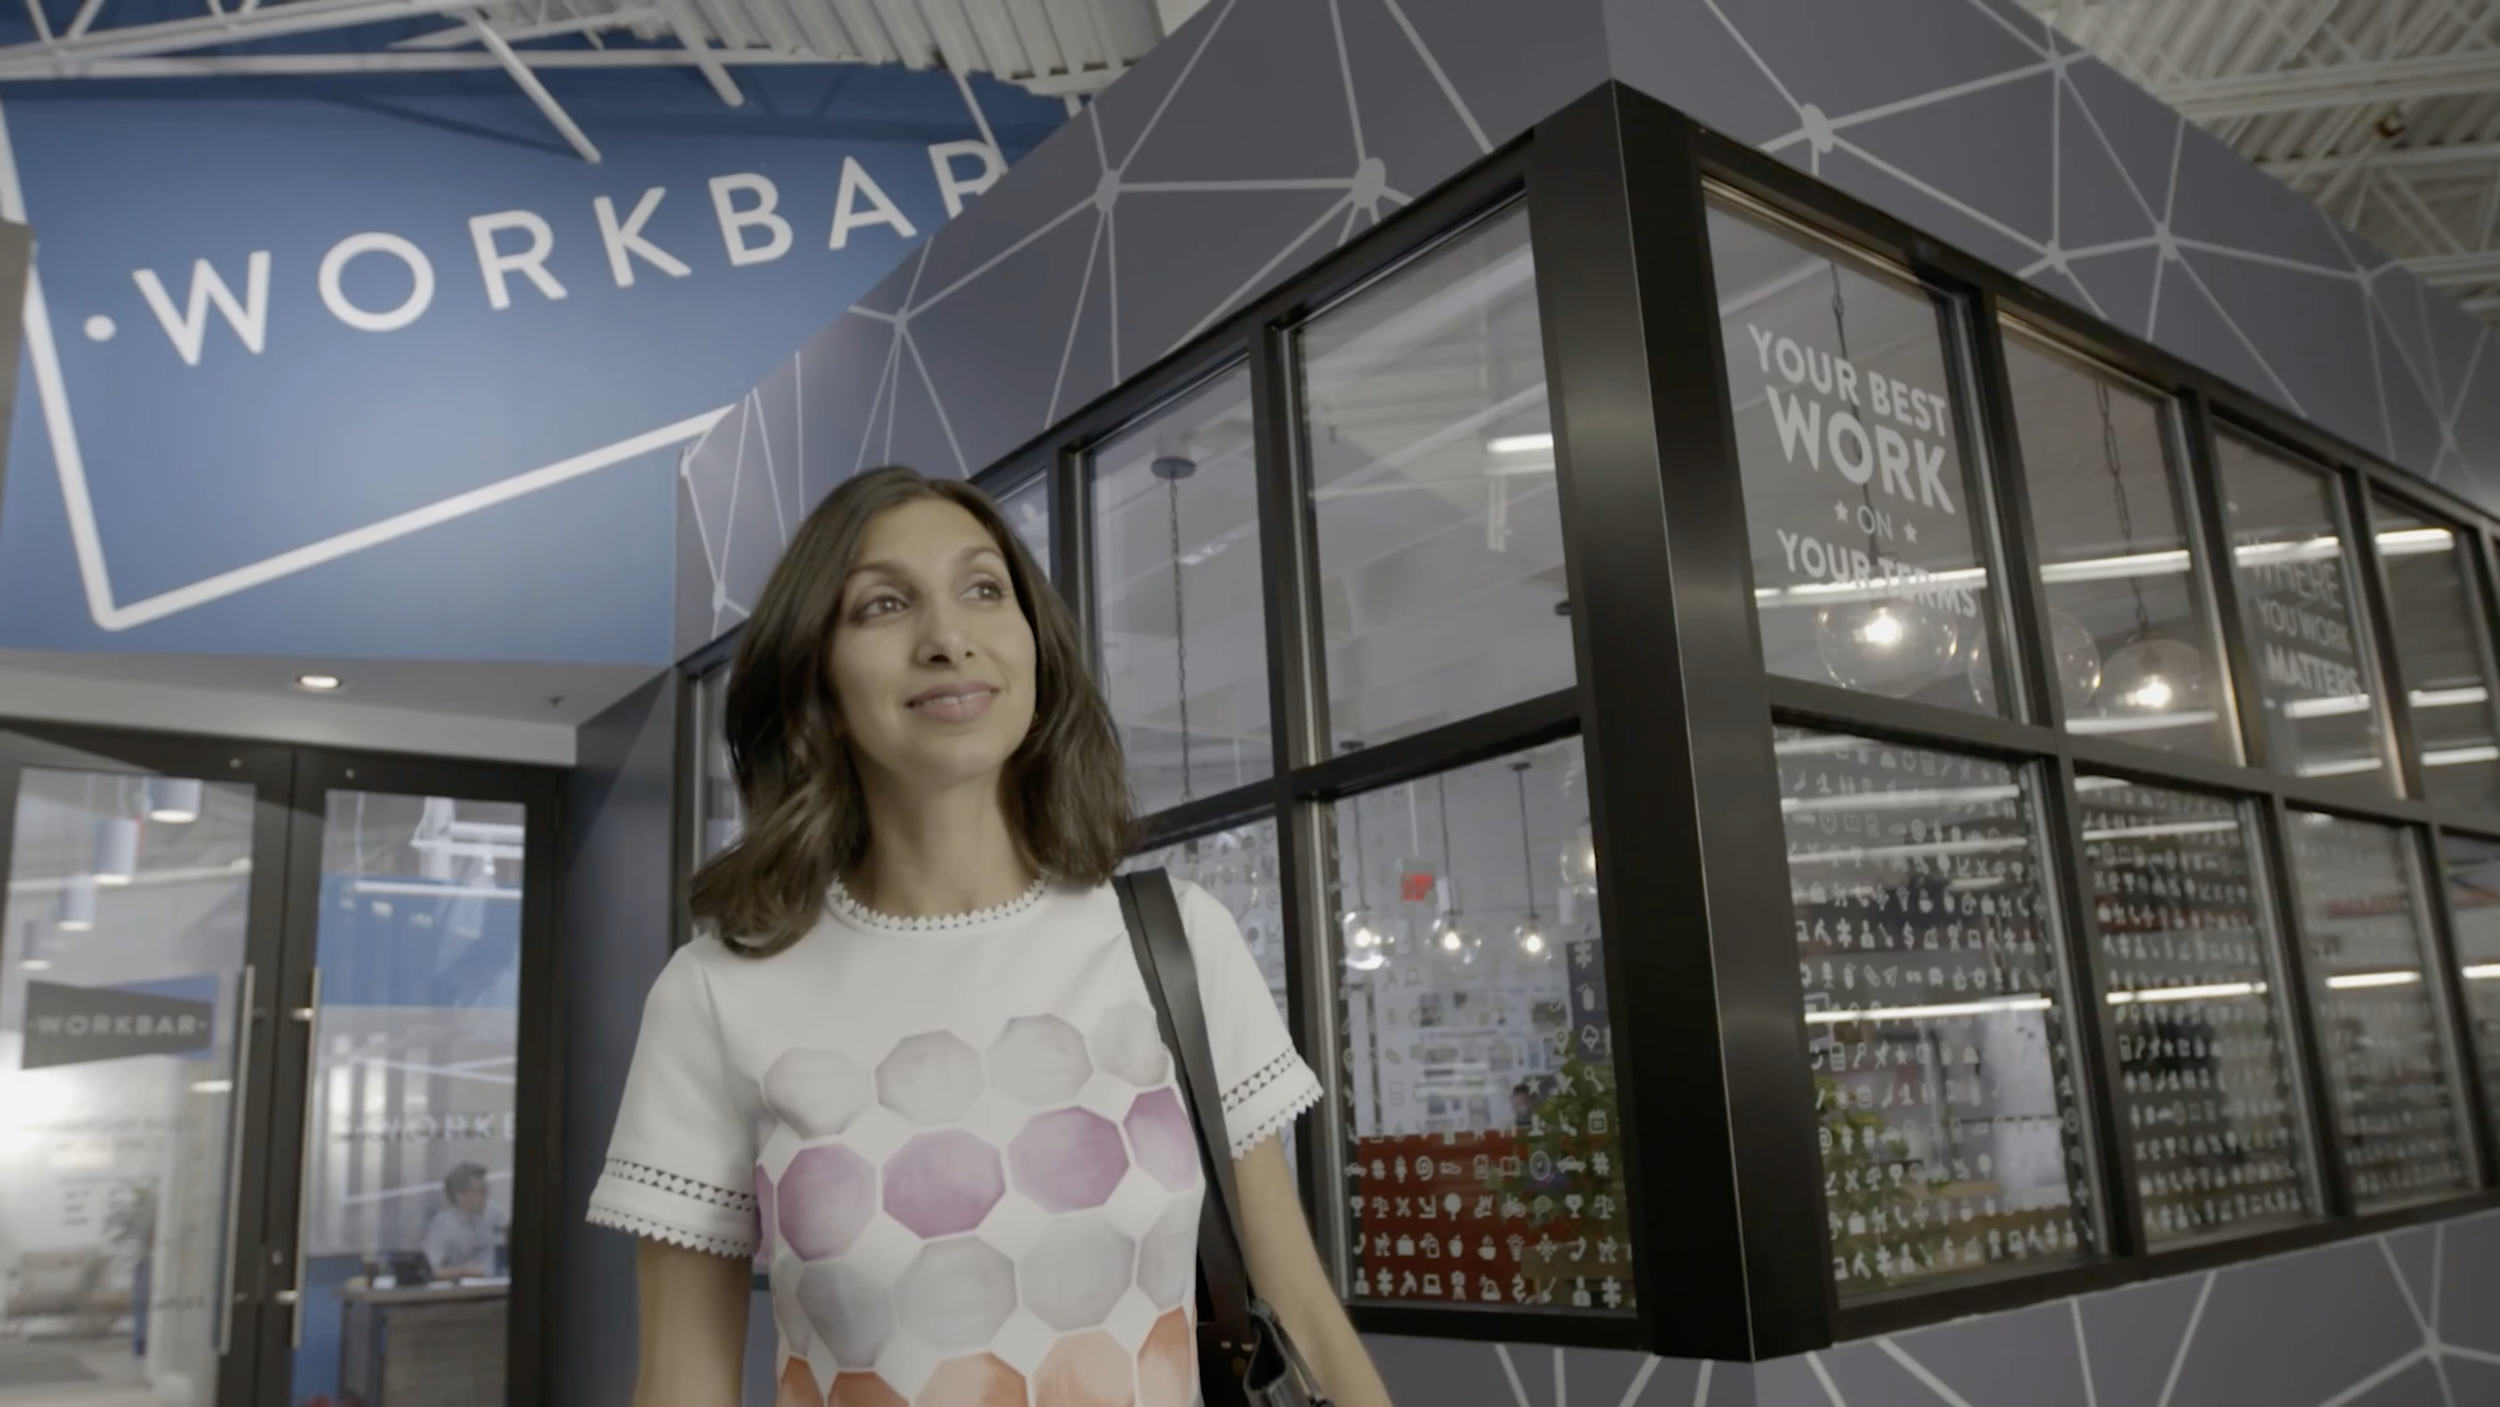 Workbar - Services launch